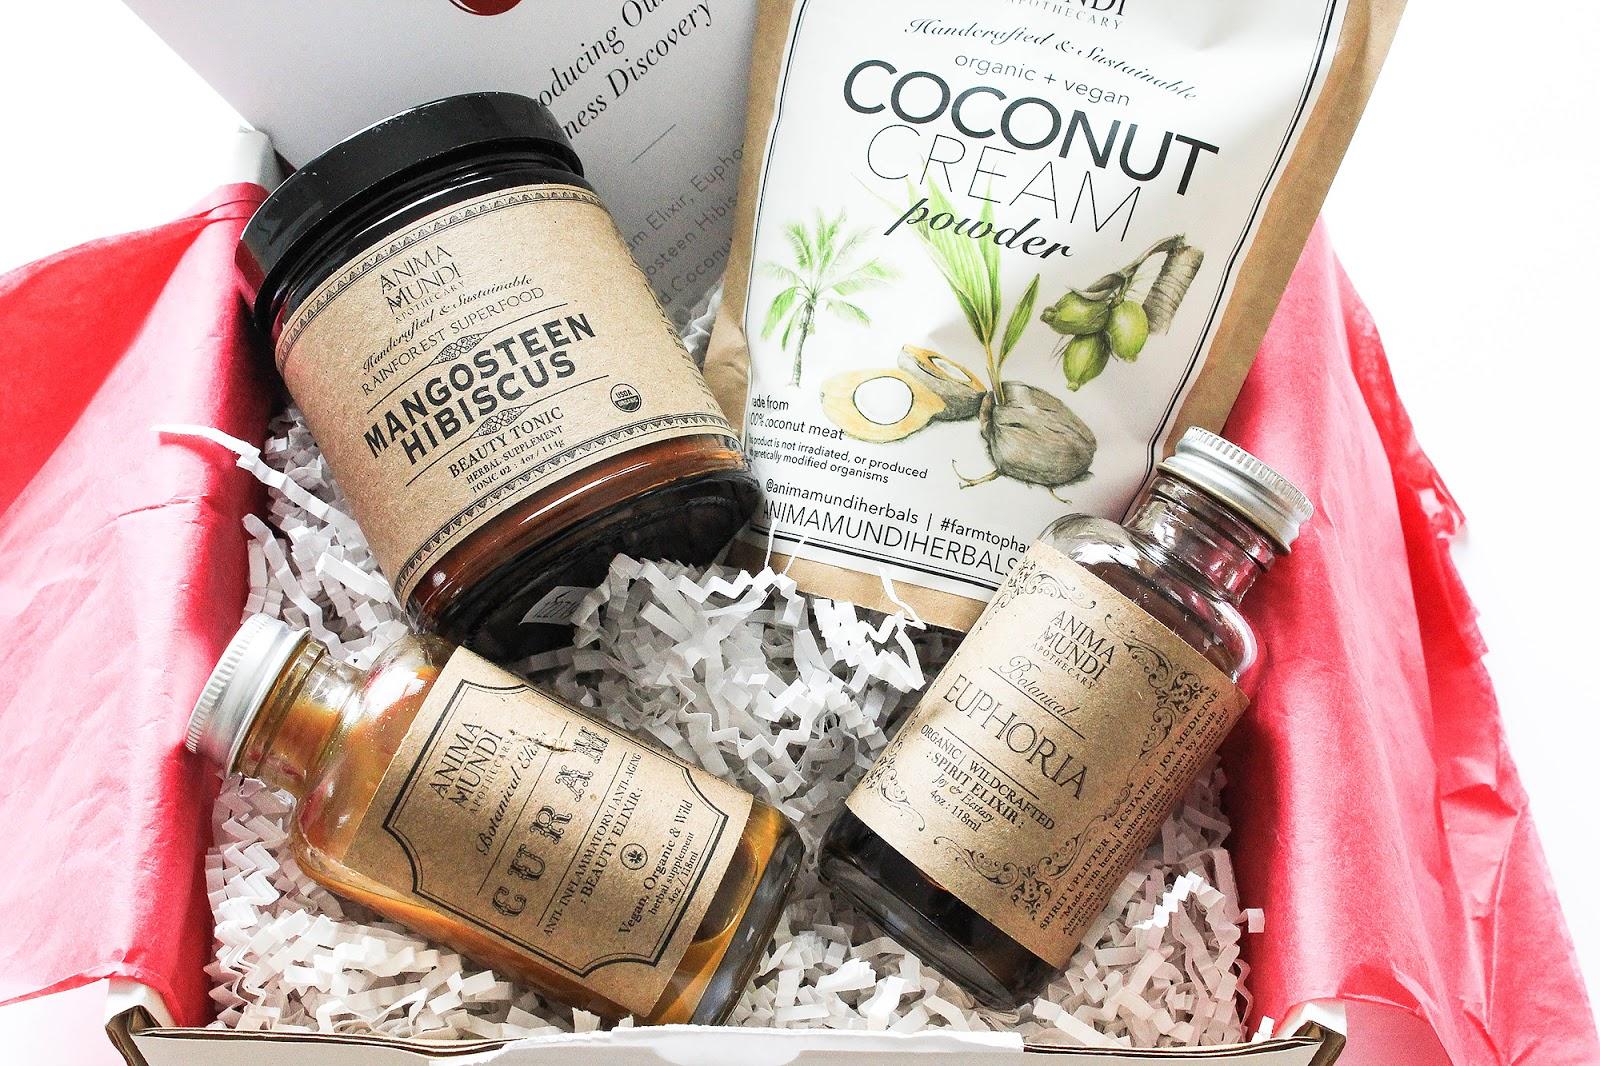 Beauty Heroes Anima Mundi Wellness Discovery. Curam Elixir, Euphoria Spirit Elixir, Mangosteen Hibiscus Superfood, Coconut Cream Powder